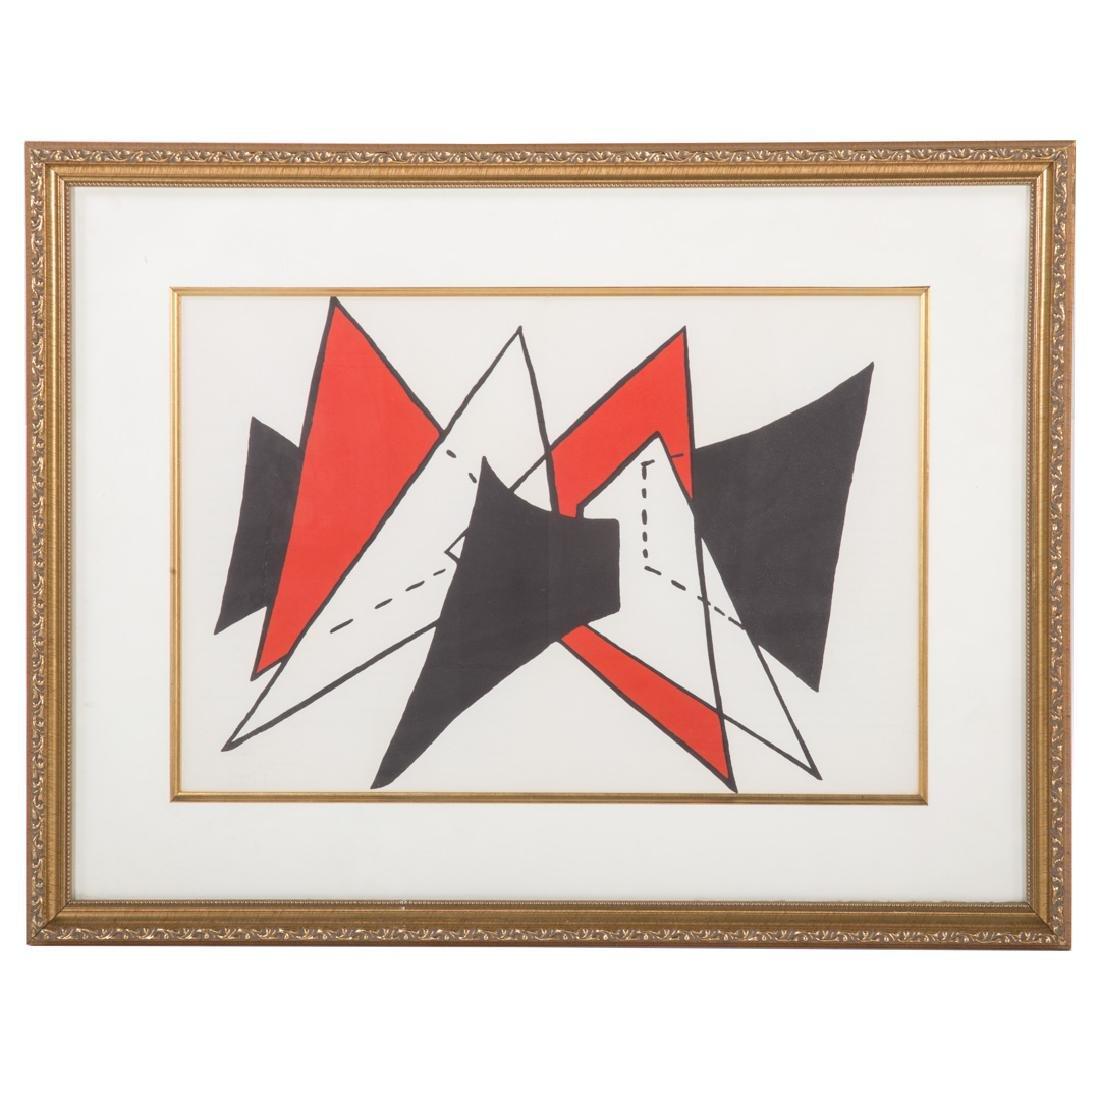 "Alexander Calder. ""Stabiles,"" lithograph"